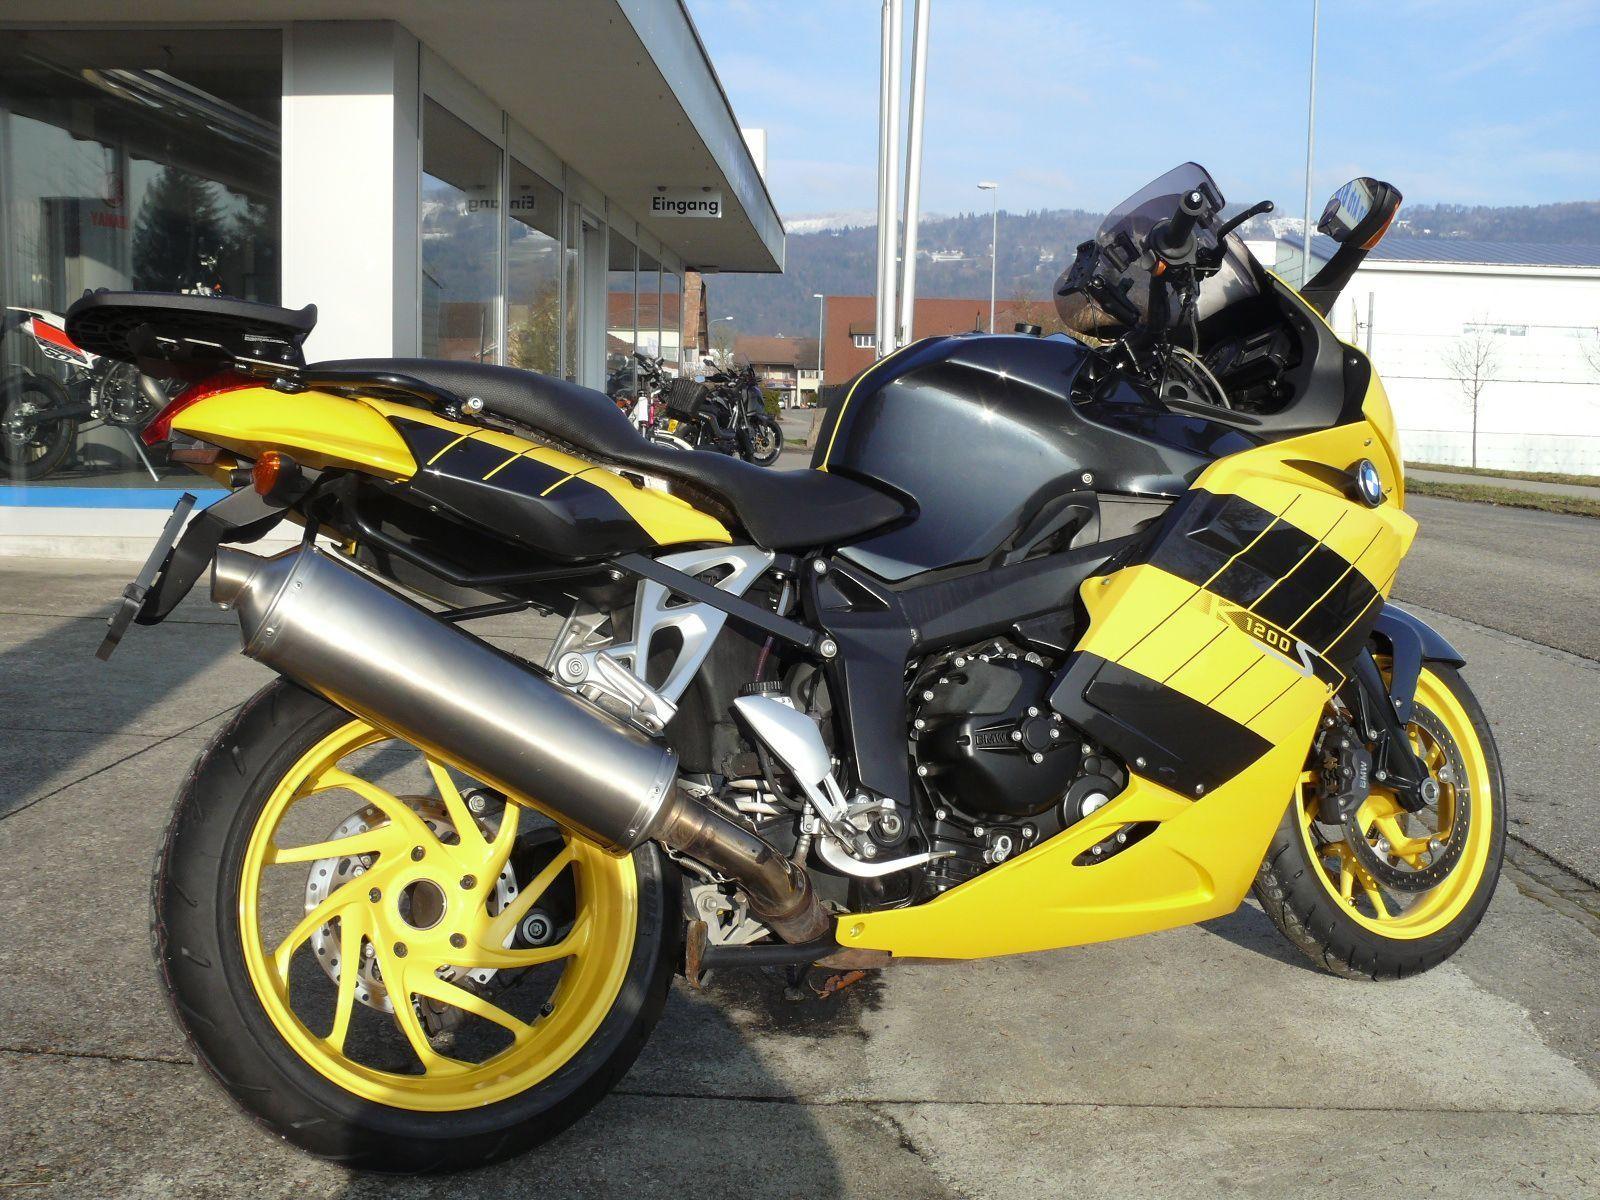 moto occasions acheter bmw k 1200 s von arb bike ag neuendorf. Black Bedroom Furniture Sets. Home Design Ideas